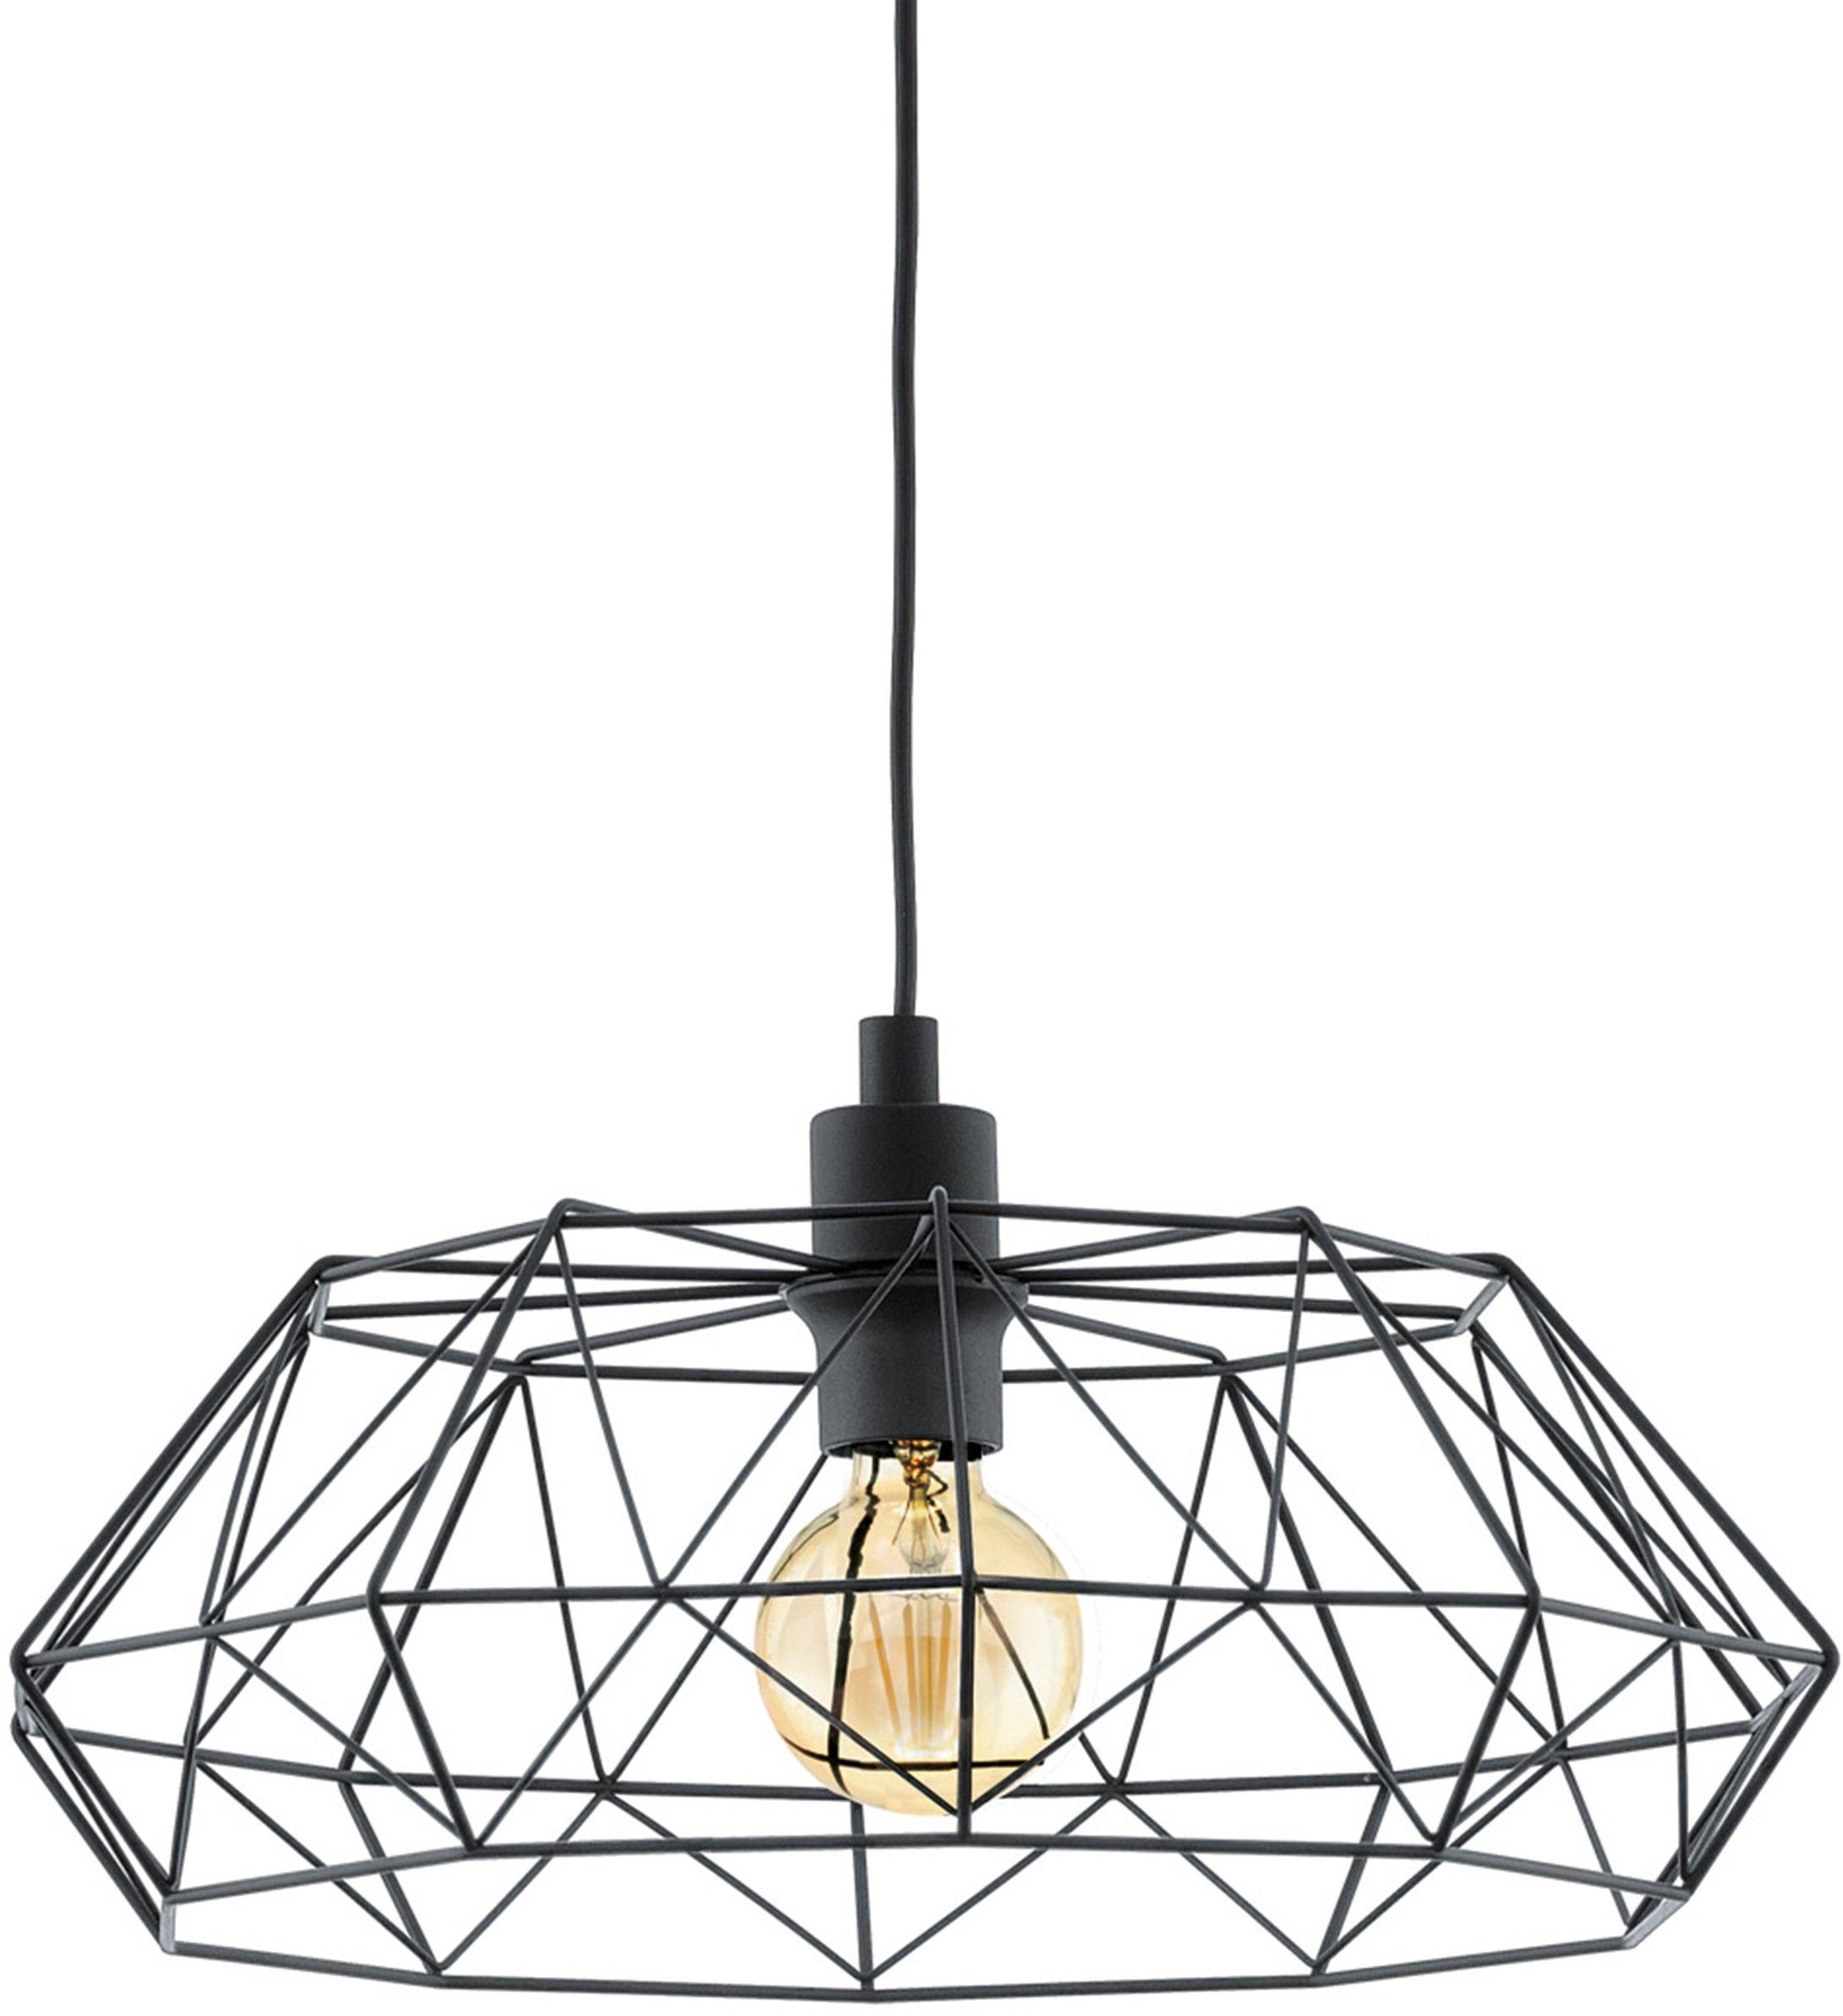 EGLO Hanglamp CARLTON 2 Hanglicht, hanglamp bij OTTO online kopen